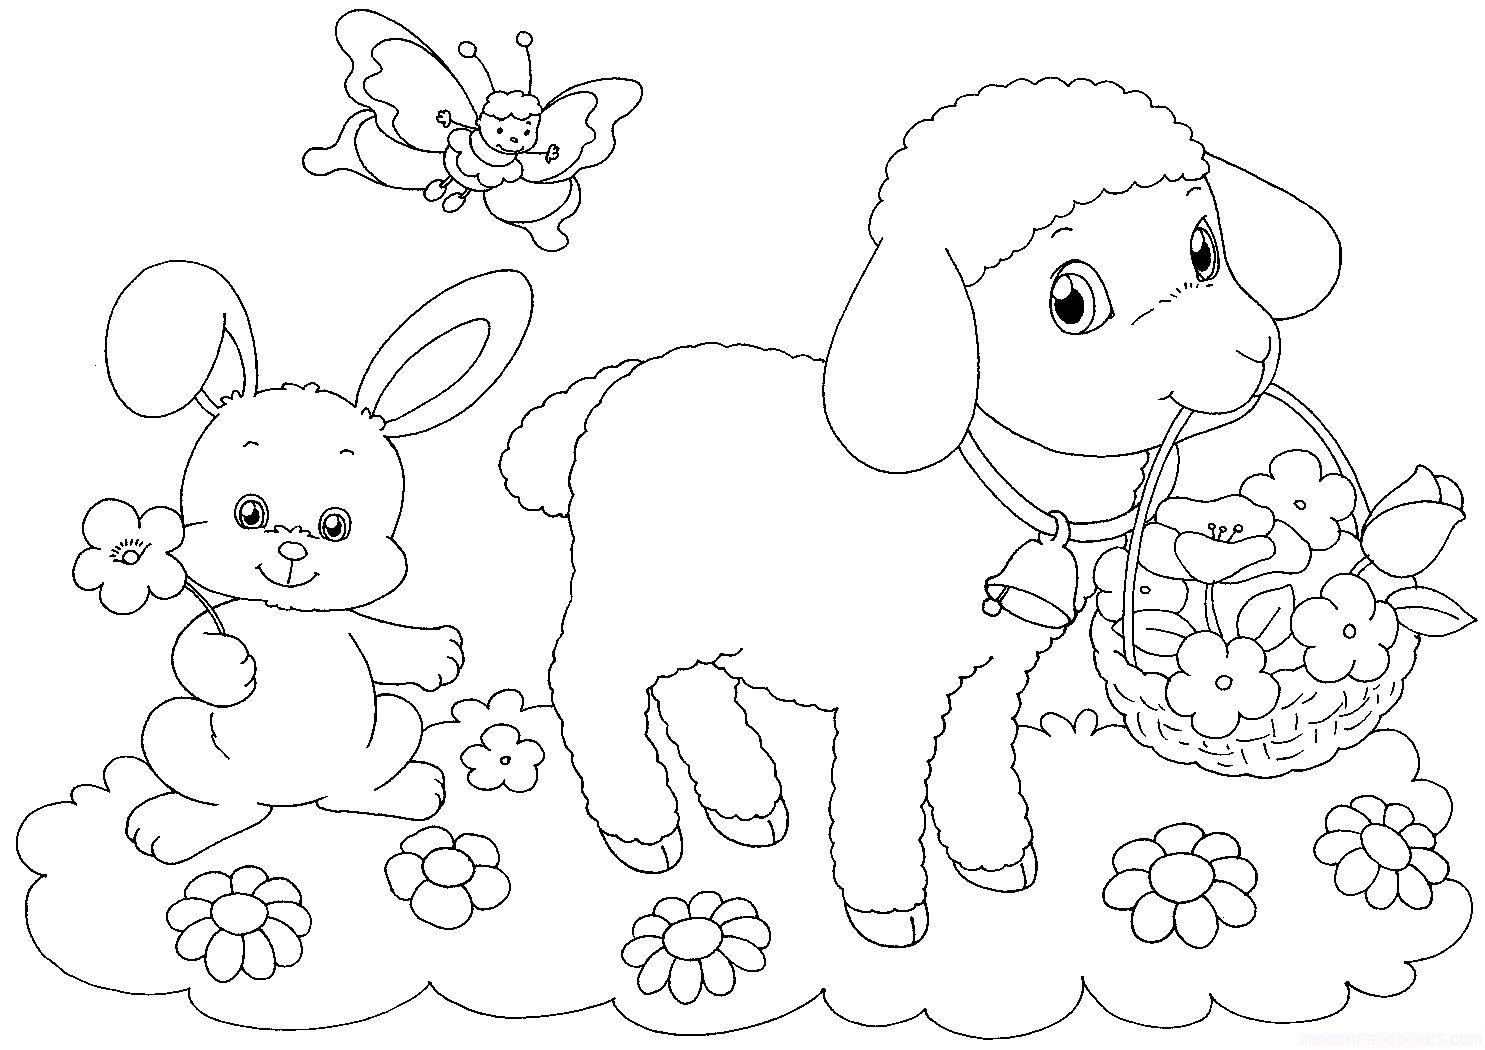 ovejitas & ovejitas para colorear - Buscar con Google | Dibujos ...